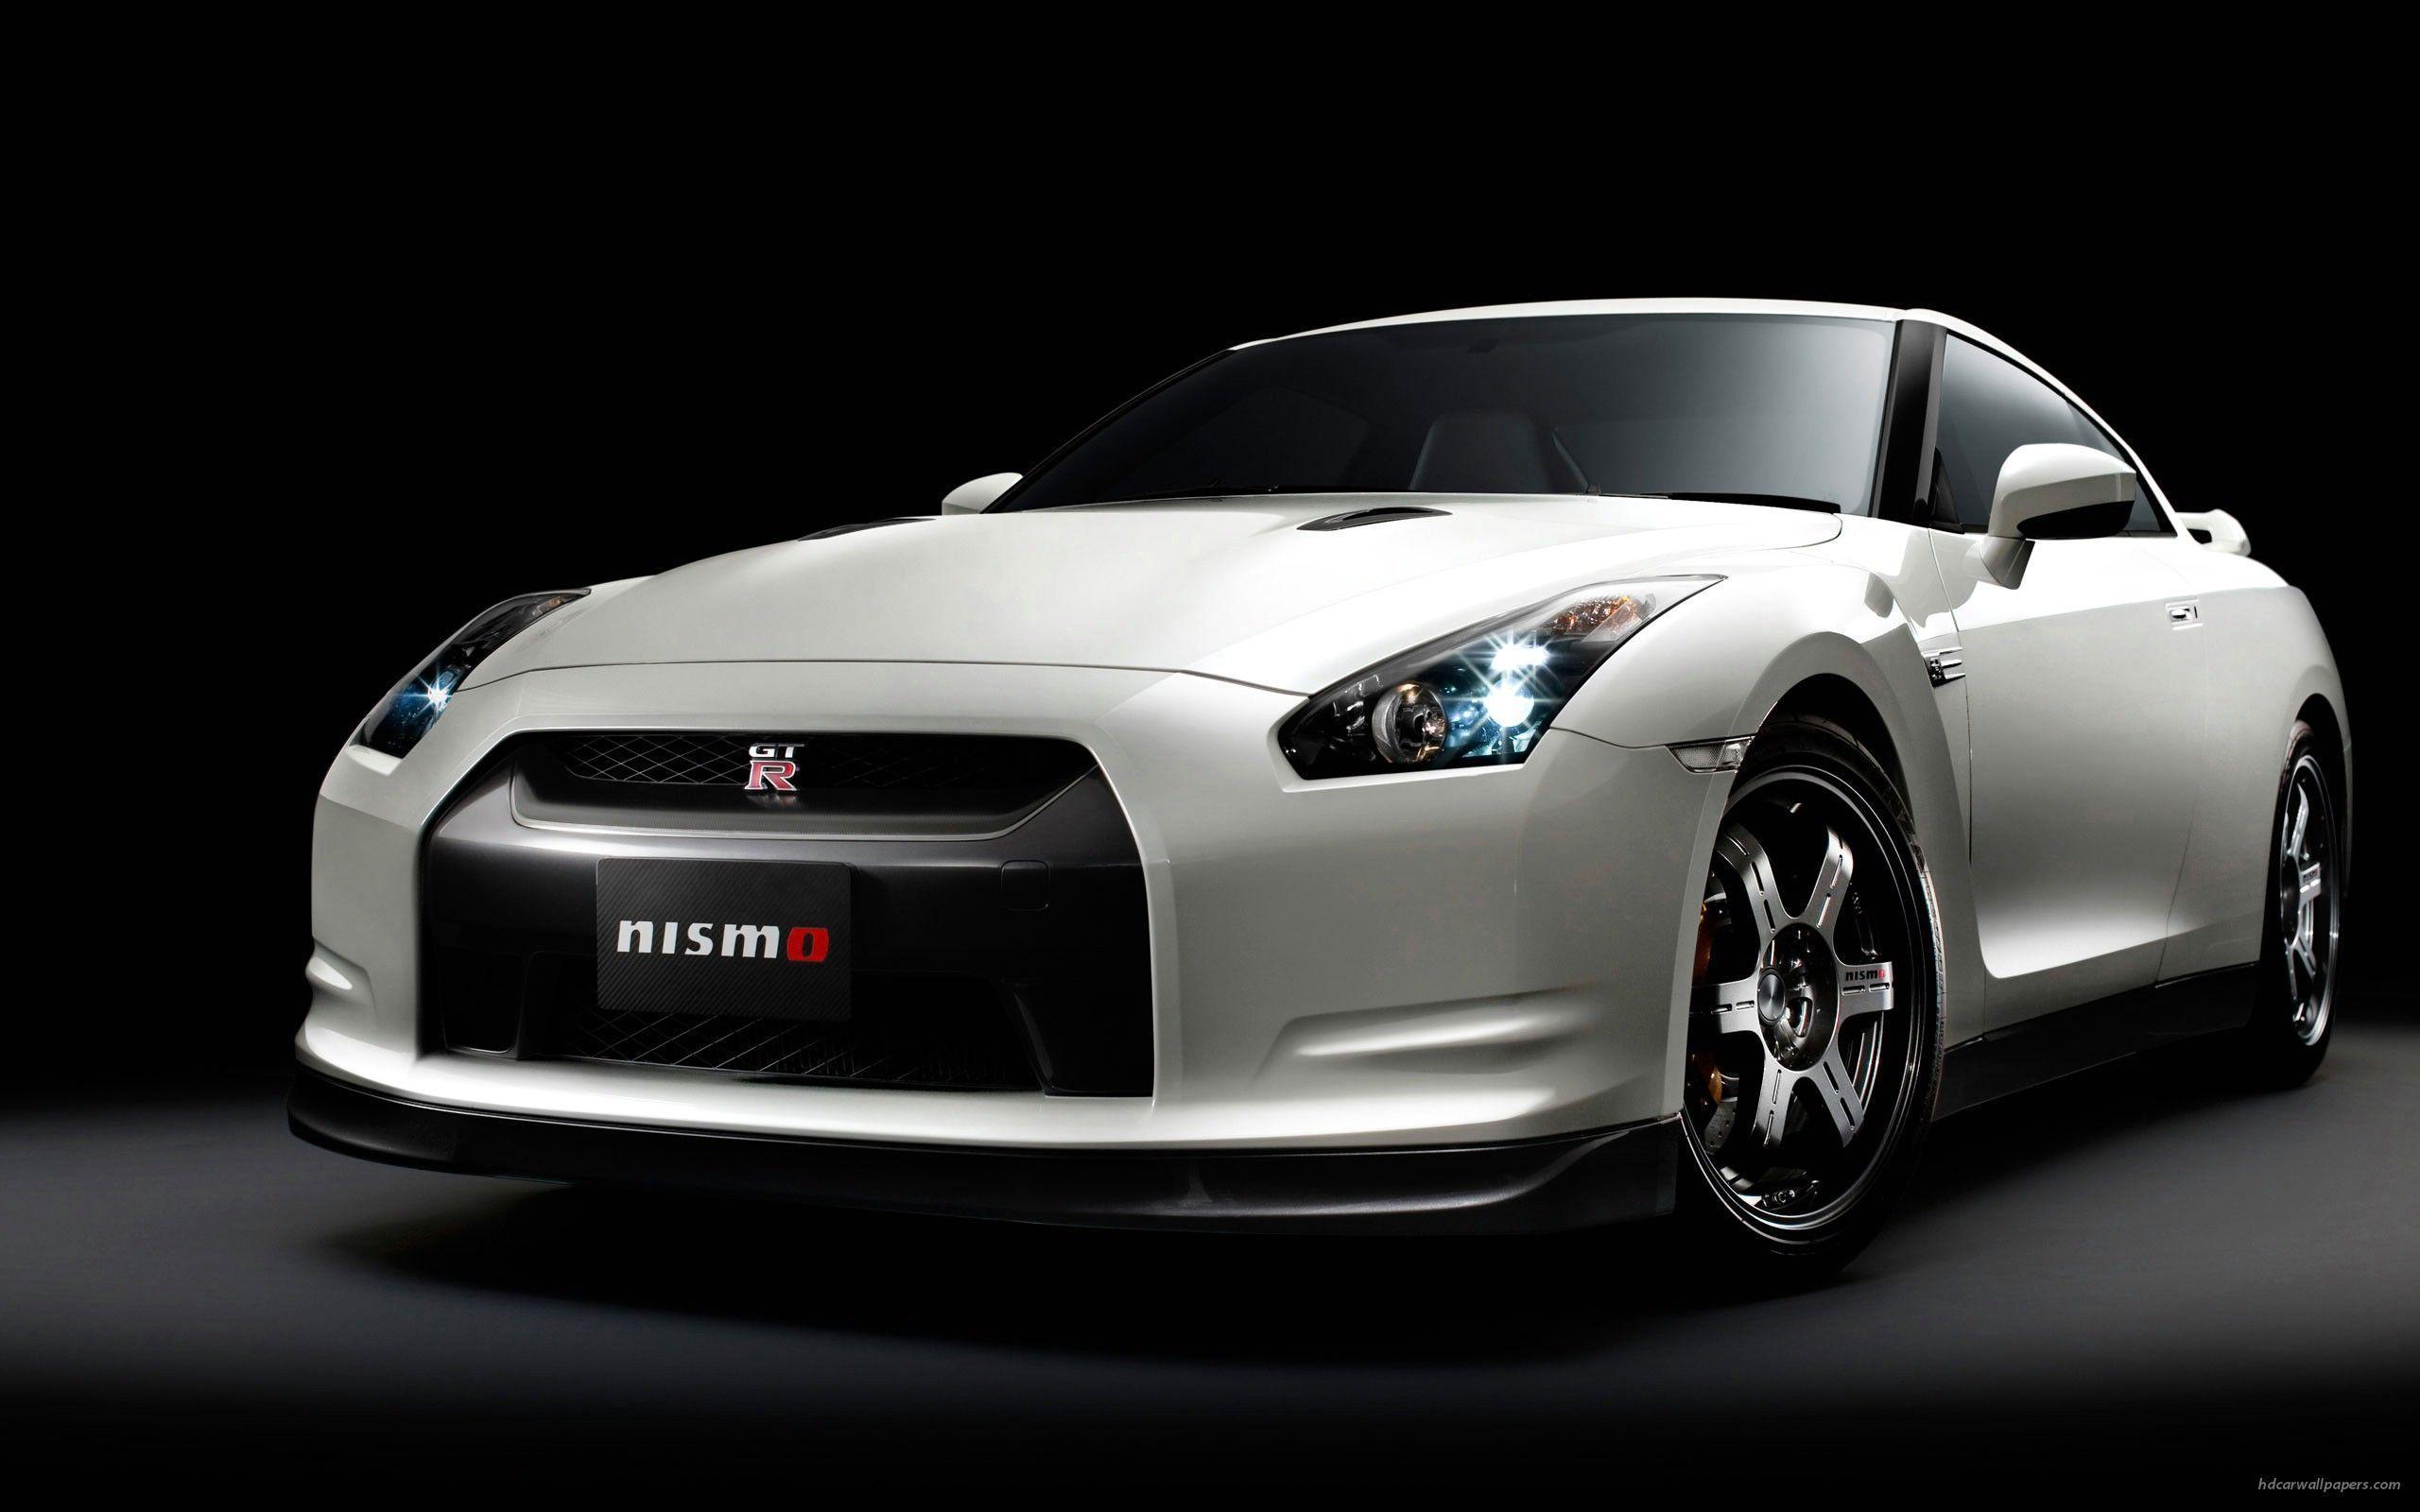 Nissan <b>GT-R</b> SpecV R35 | Nissan <b>GT-R</b> SpecV R35 Pins | Pinterest ...